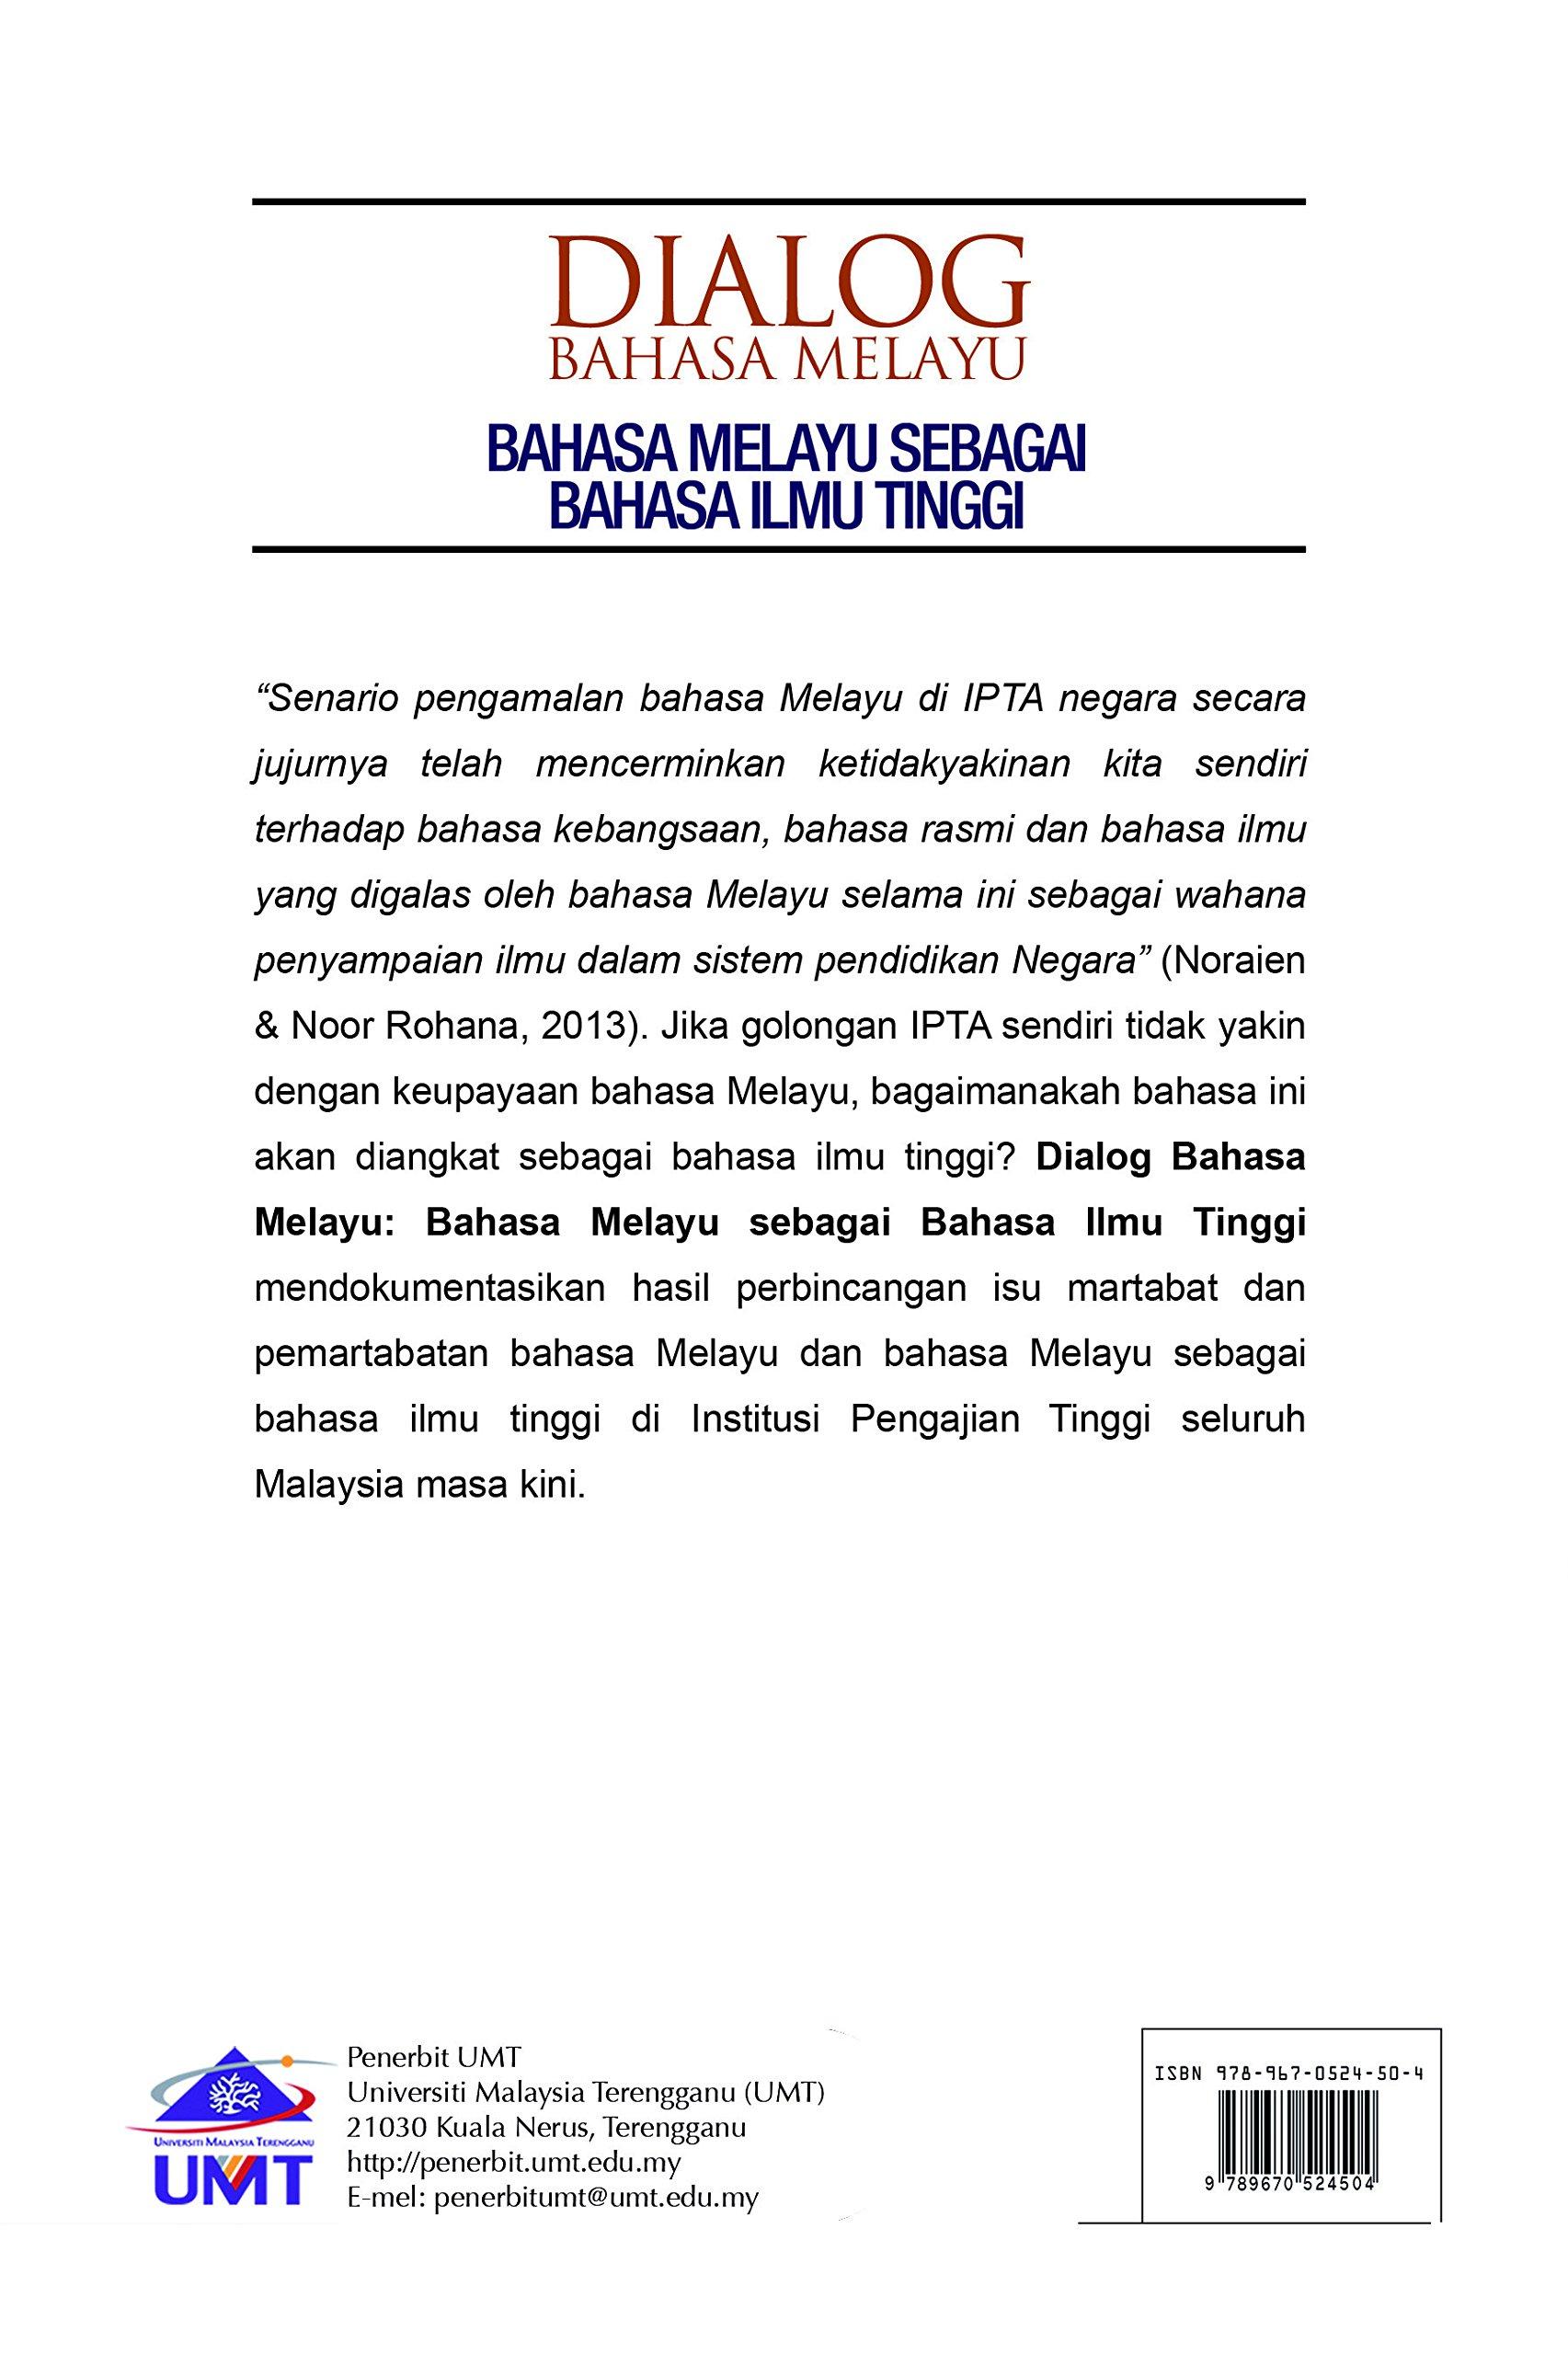 Dialog Bahasa Melayu Bahasa Melayu Sebagai Bahasa Ilmu Tinggi Dialogue Malay As A Language Of Scholarly Knowledge Noraien Mansor Noor Rohana Mansor 9789670524504 Amazon Com Books